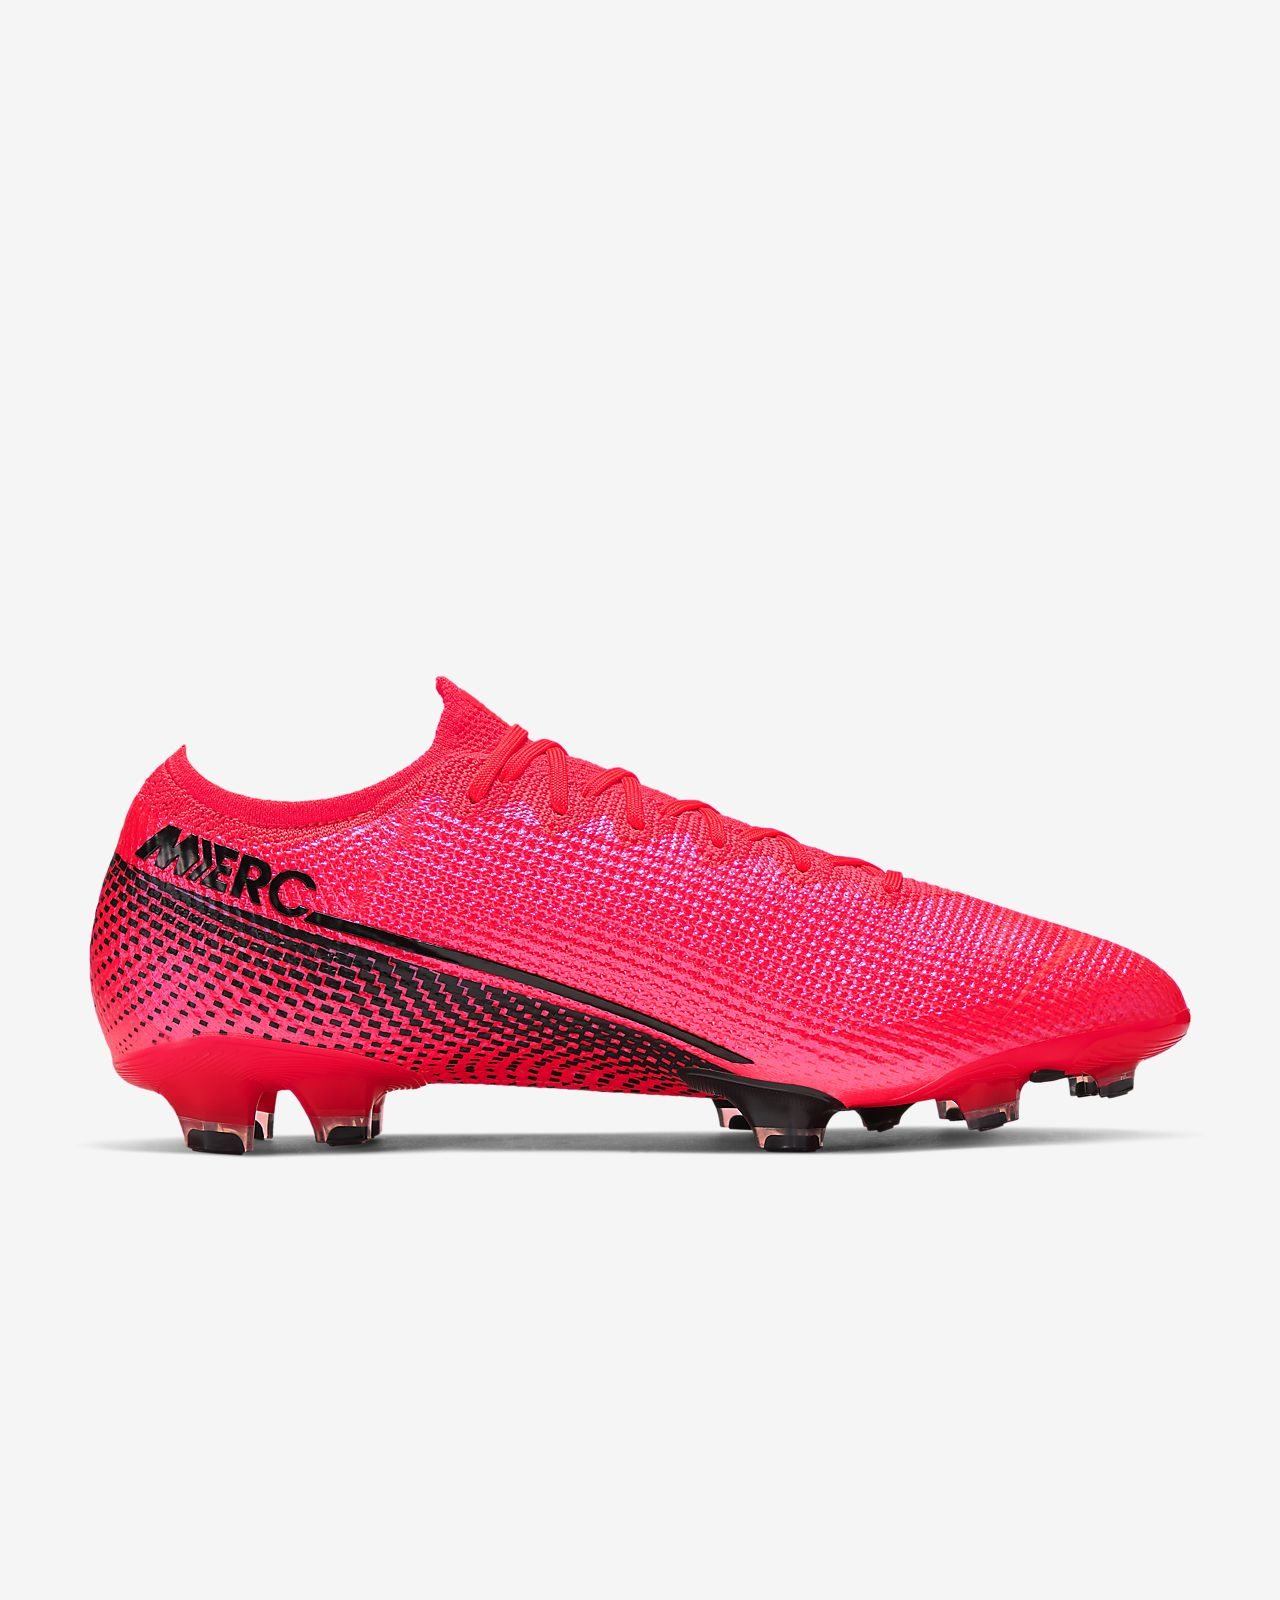 Nike Mercurial Vapor 13 Elite FG Firm Ground Soccer Cleat